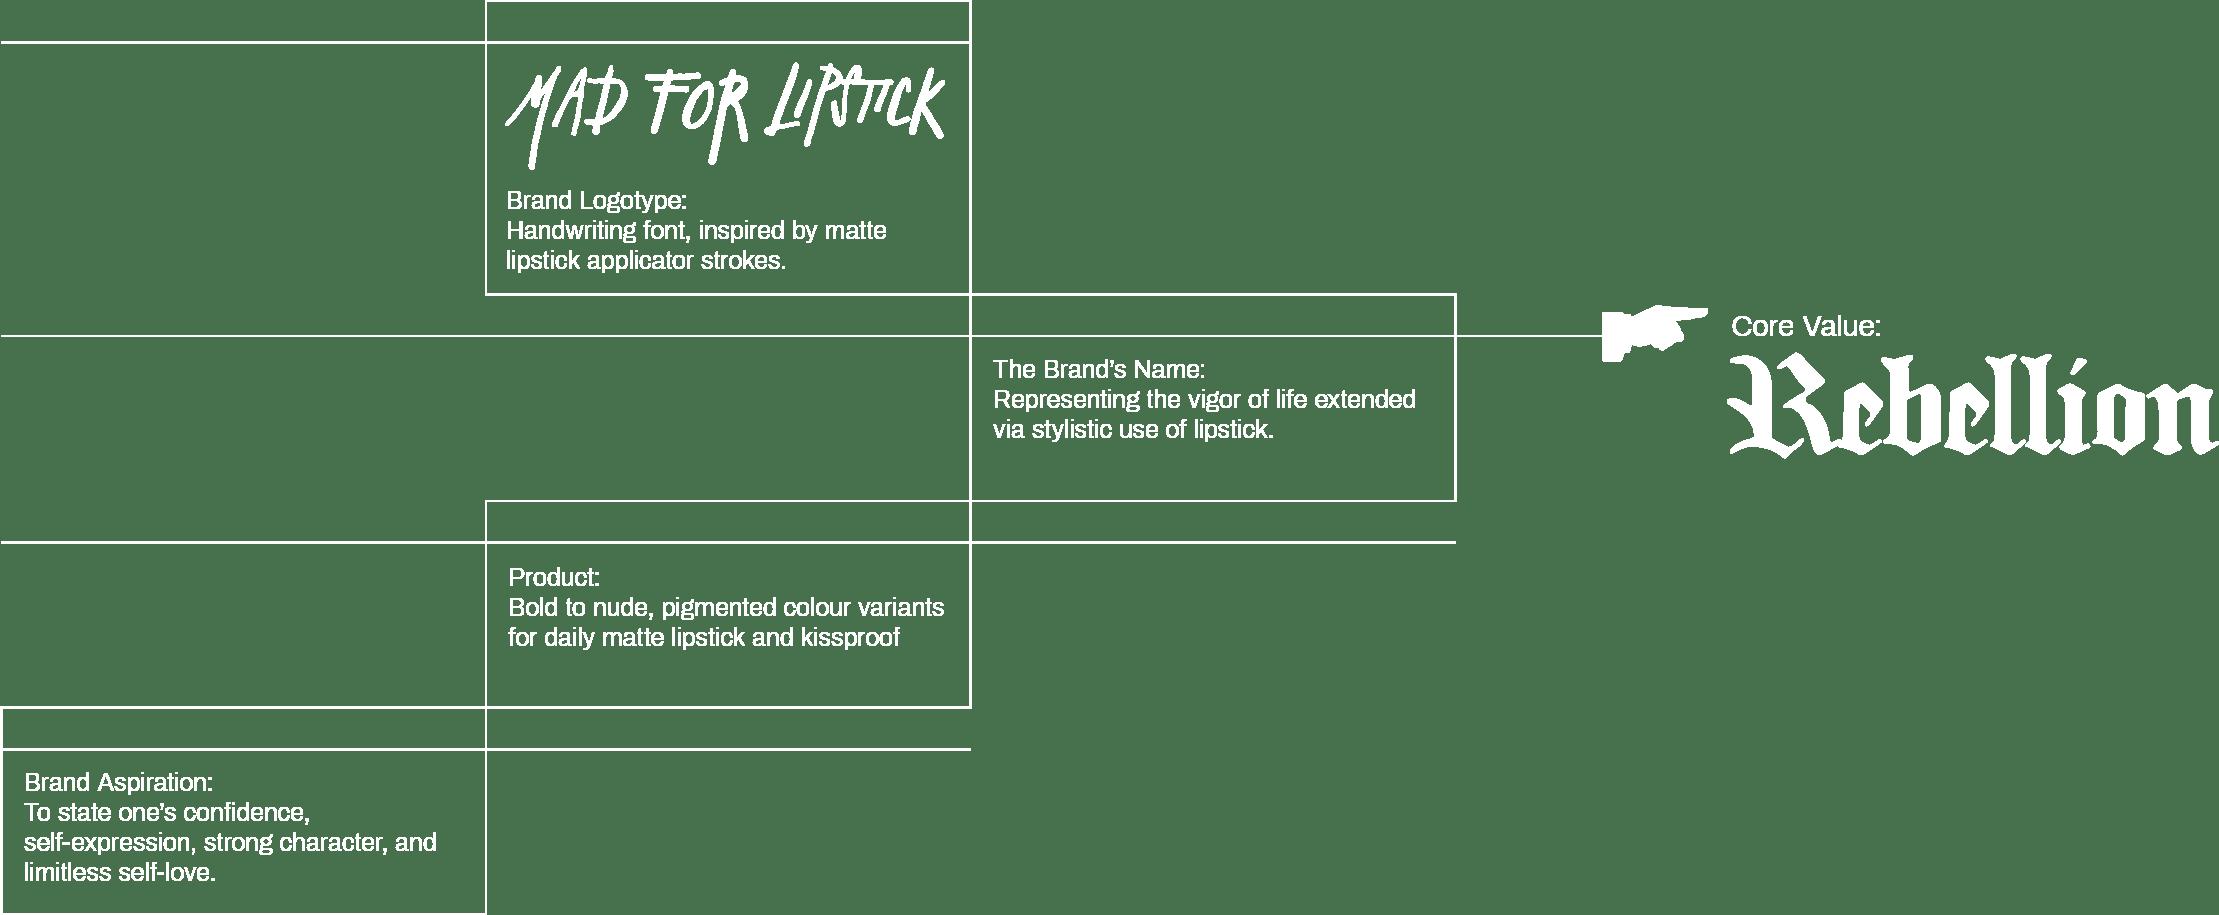 struktur mfl-04